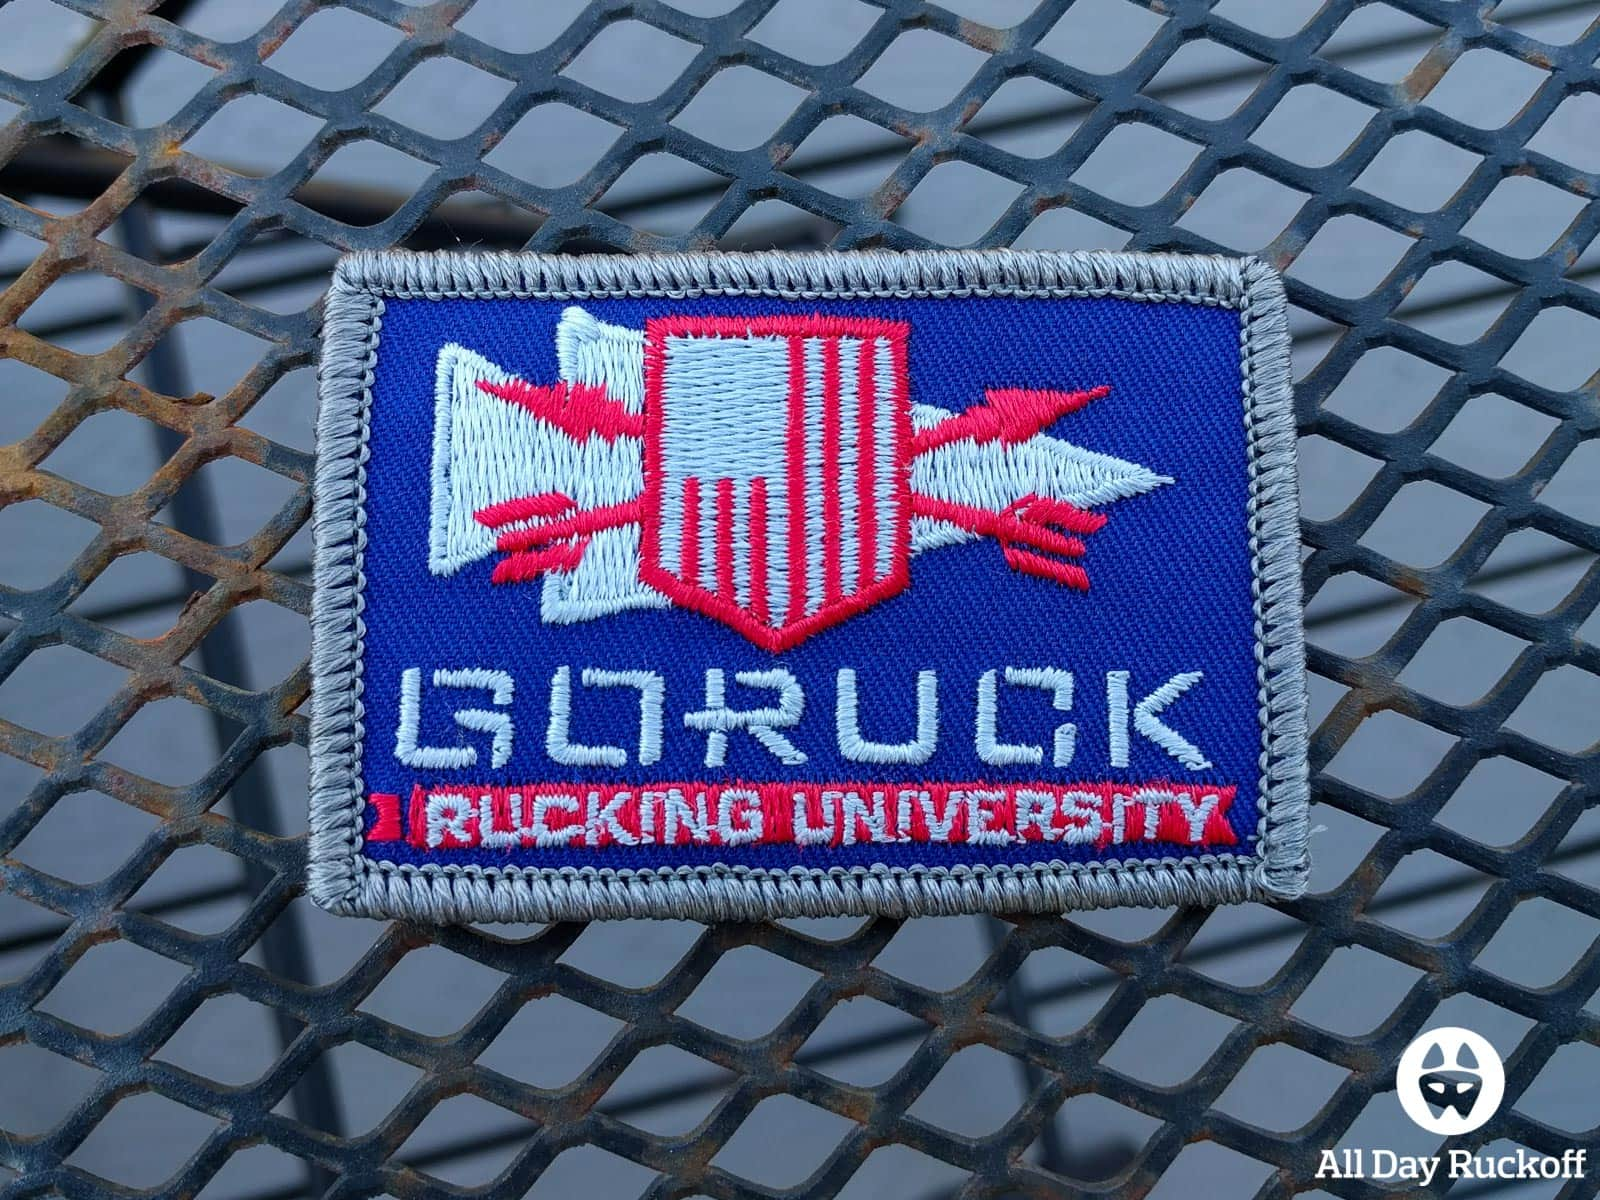 GORUCK Rucking University 004 - Rucking University Patch